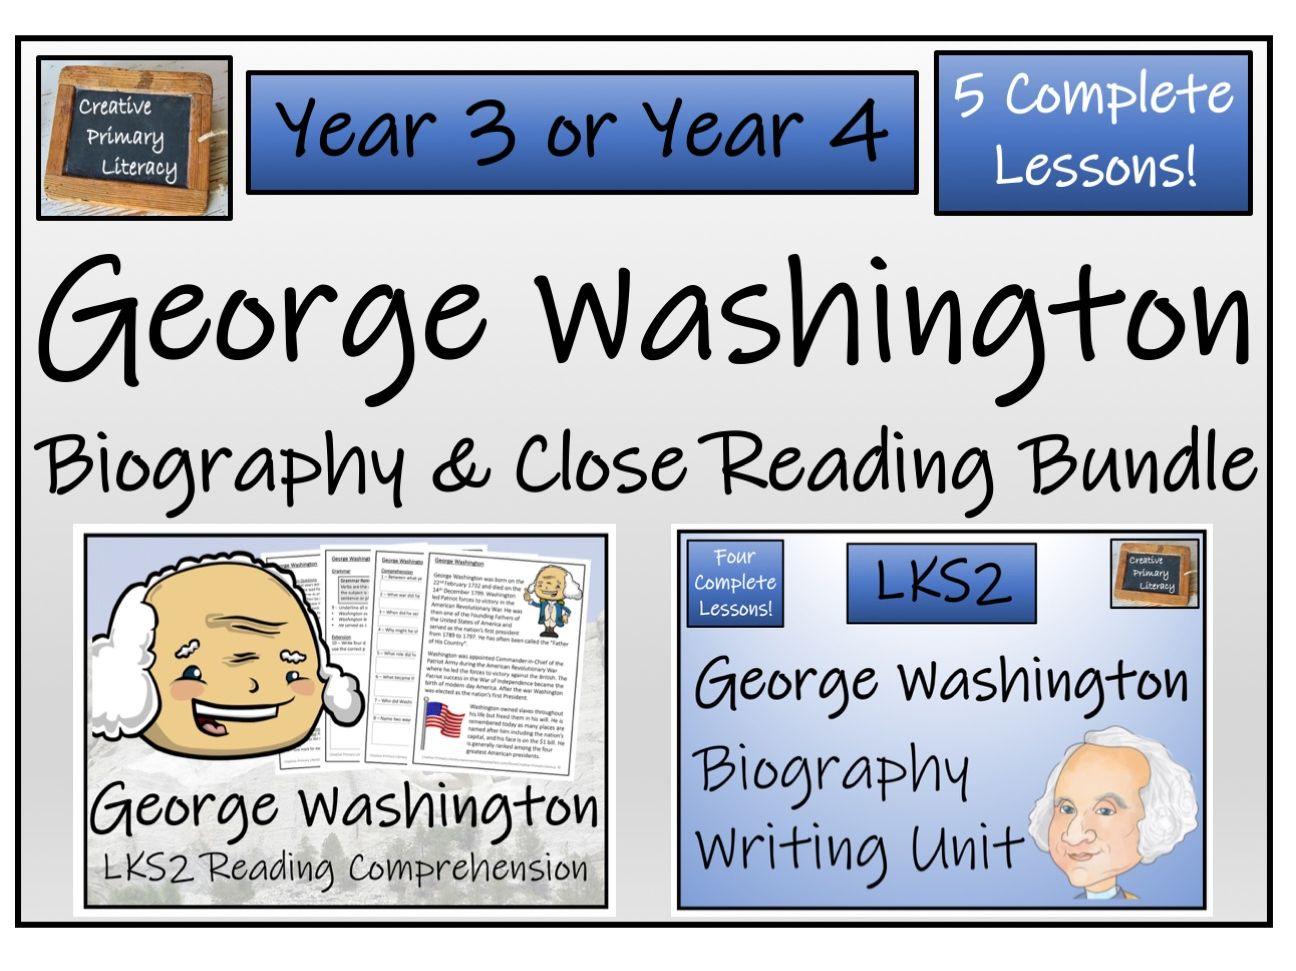 LKS2 History - George Washington Reading Comprehension & Biography Bundle